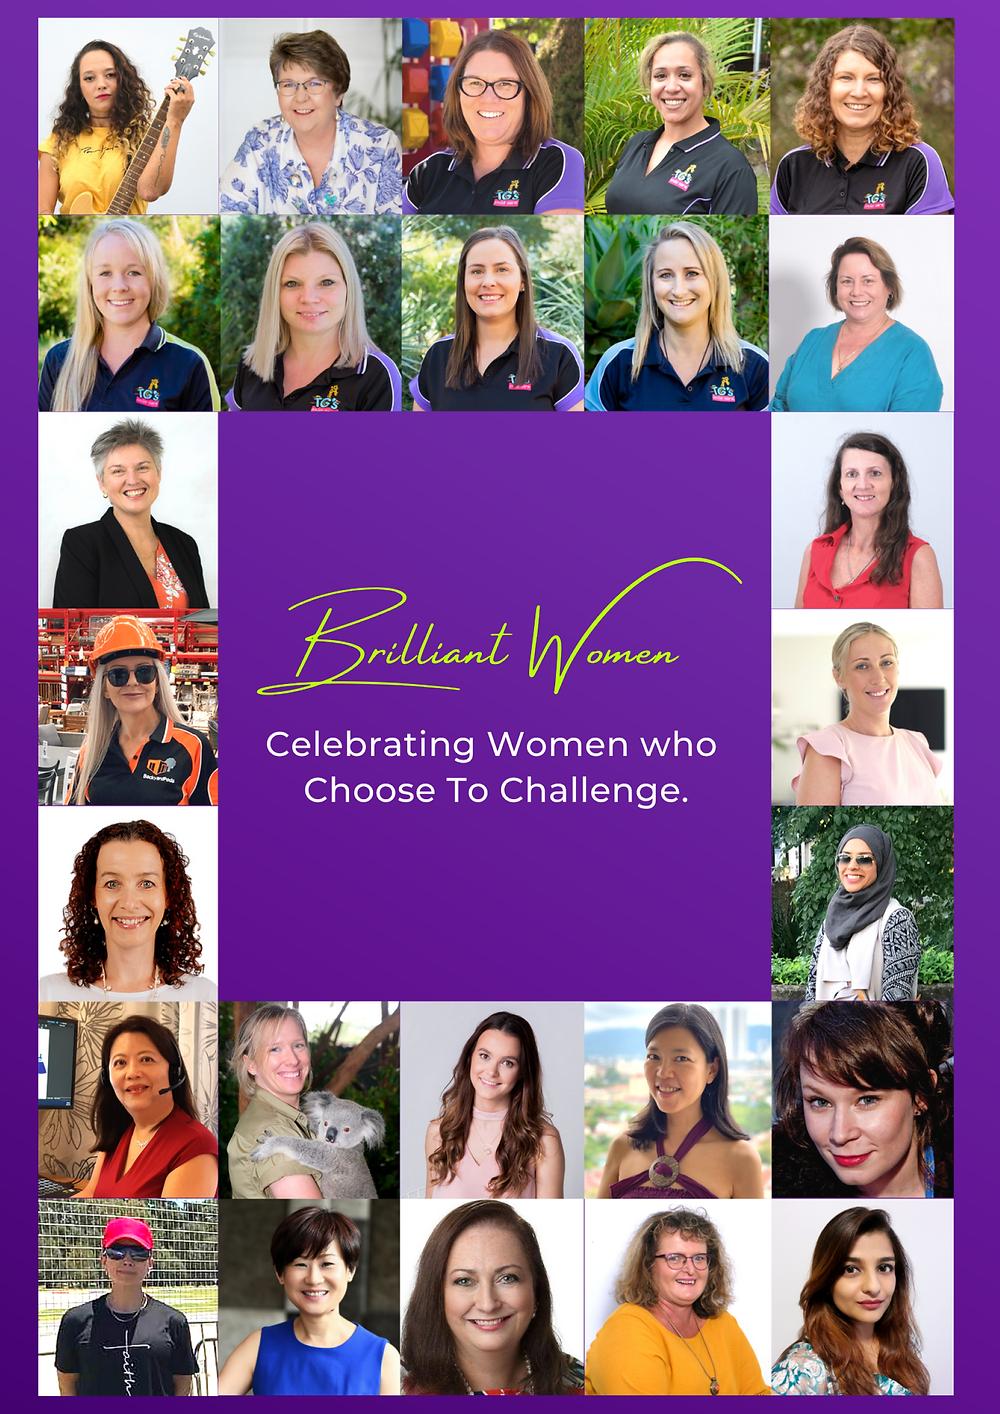 Celebrating Women, March 2021, Brilliant-Online